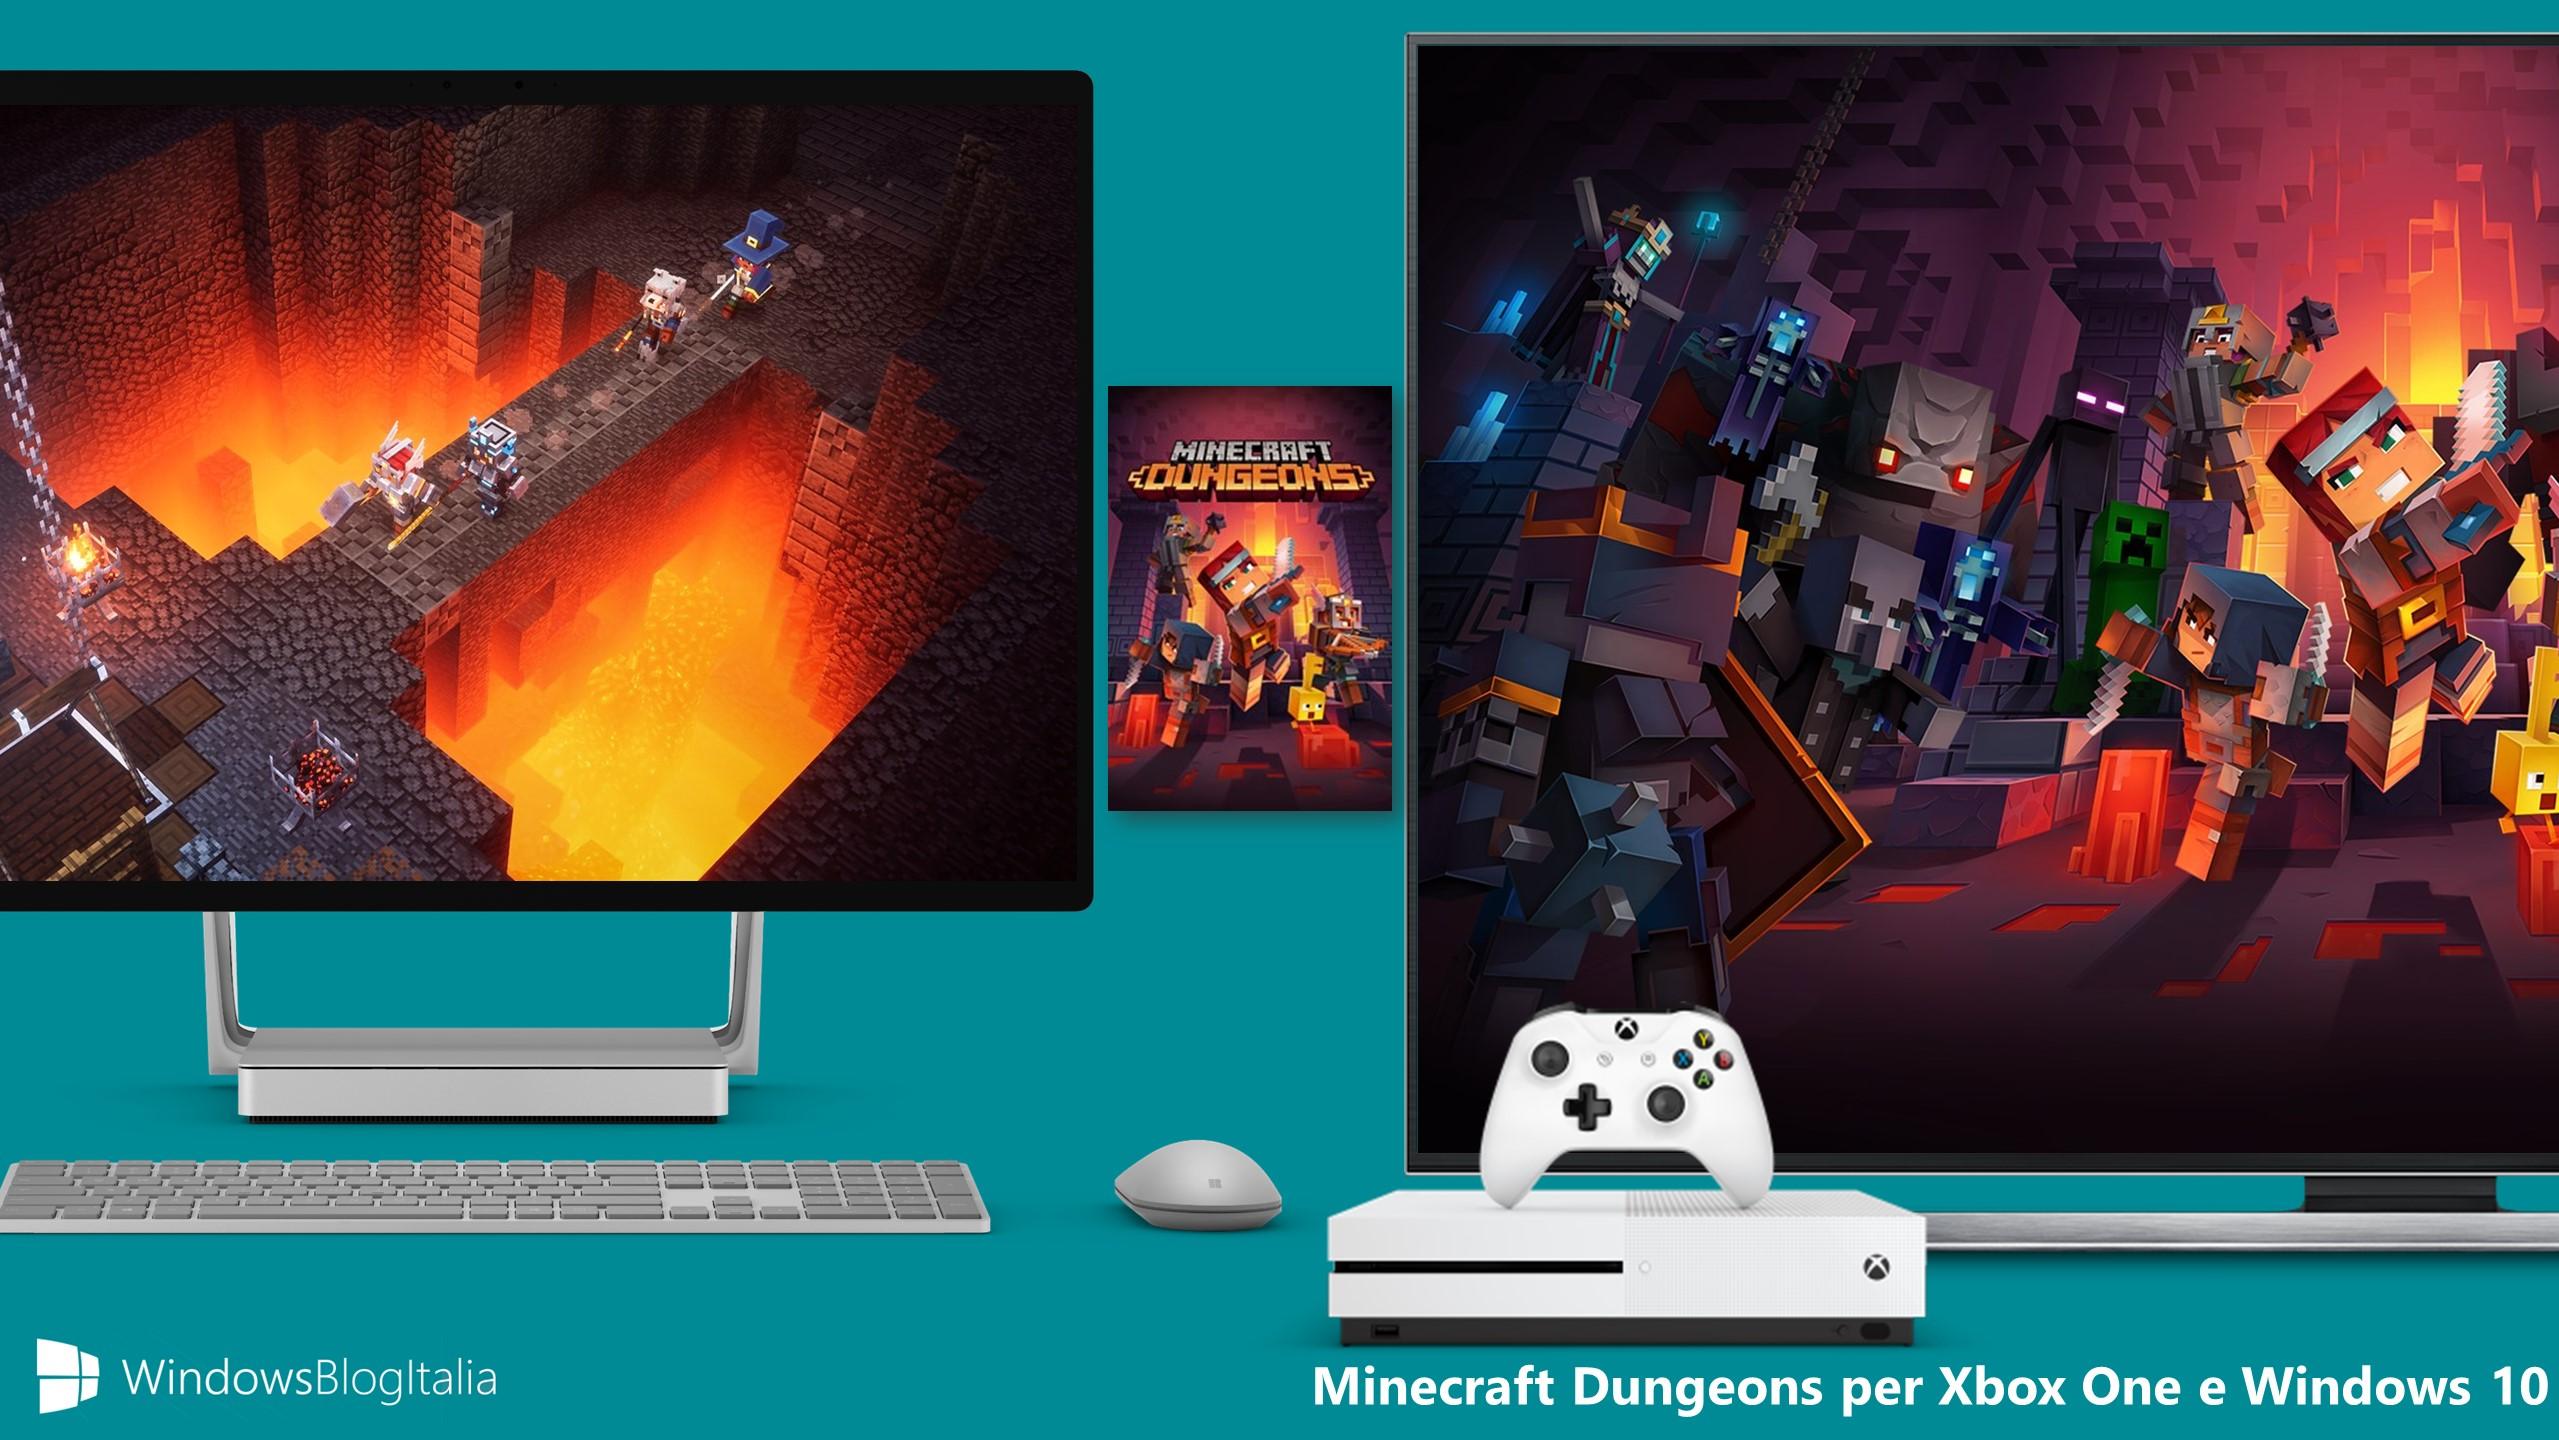 Minecraft Dungeons per Xbox One e Windows 10